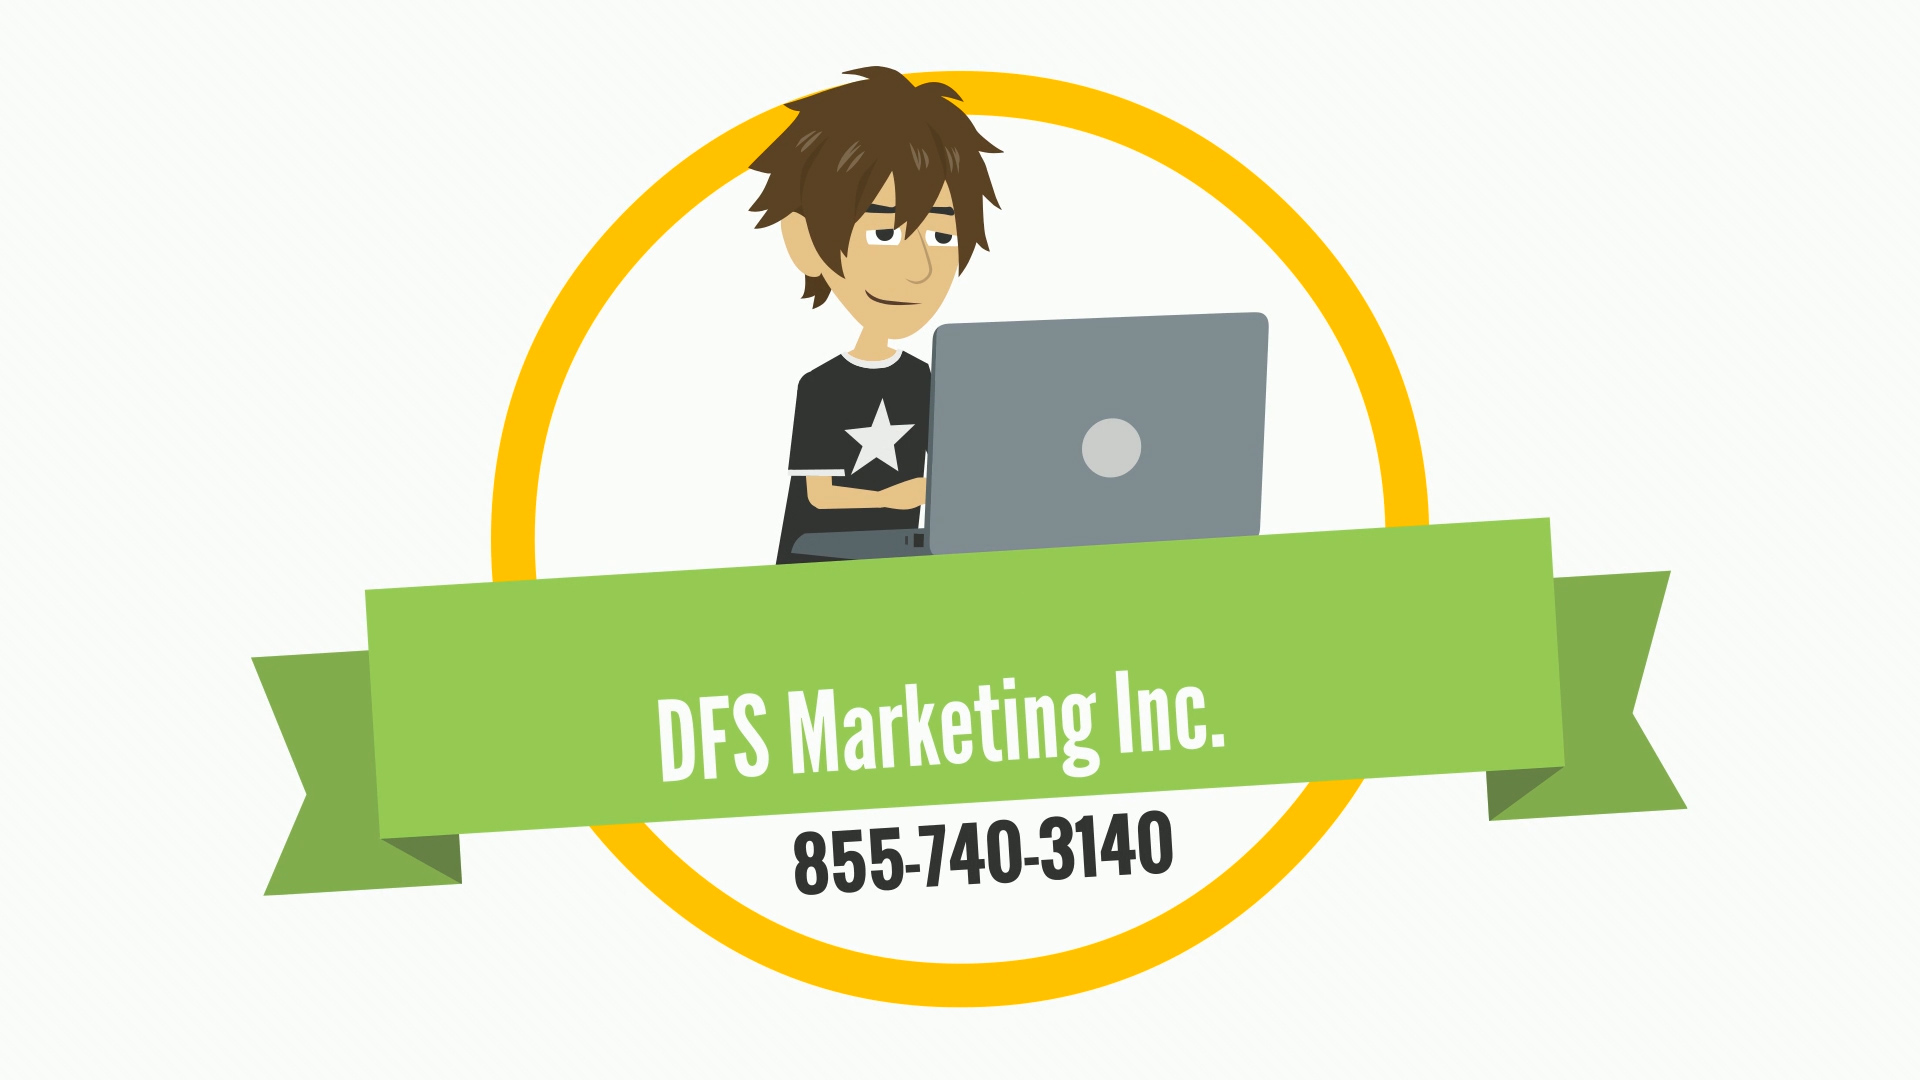 DFS Marketing Inc.(Insurance Marketing), Conroe Texas (TX ...